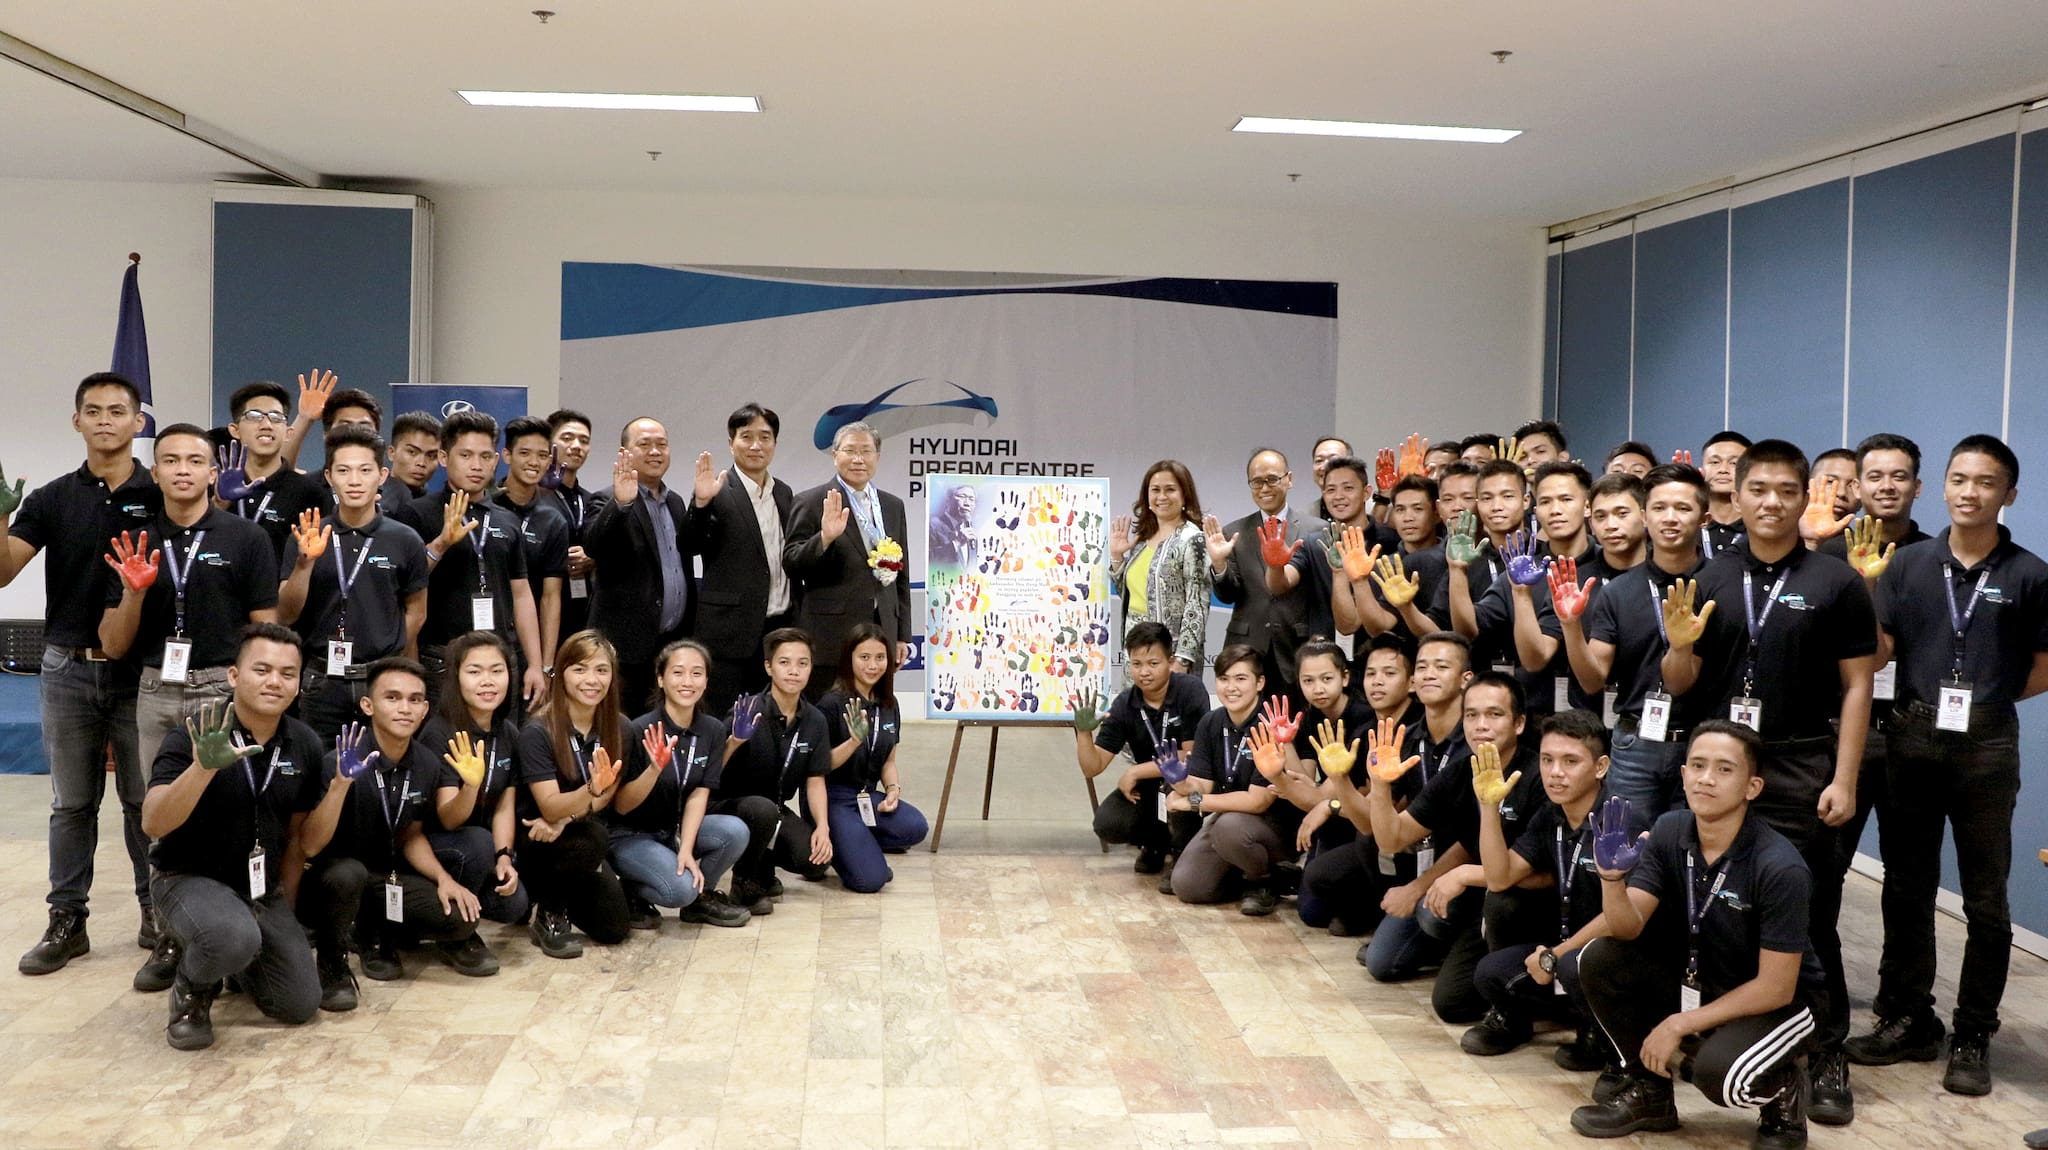 Korean Ambassador Lauds Hyundai PH for Advancing Technology, Korea-PH Partnership